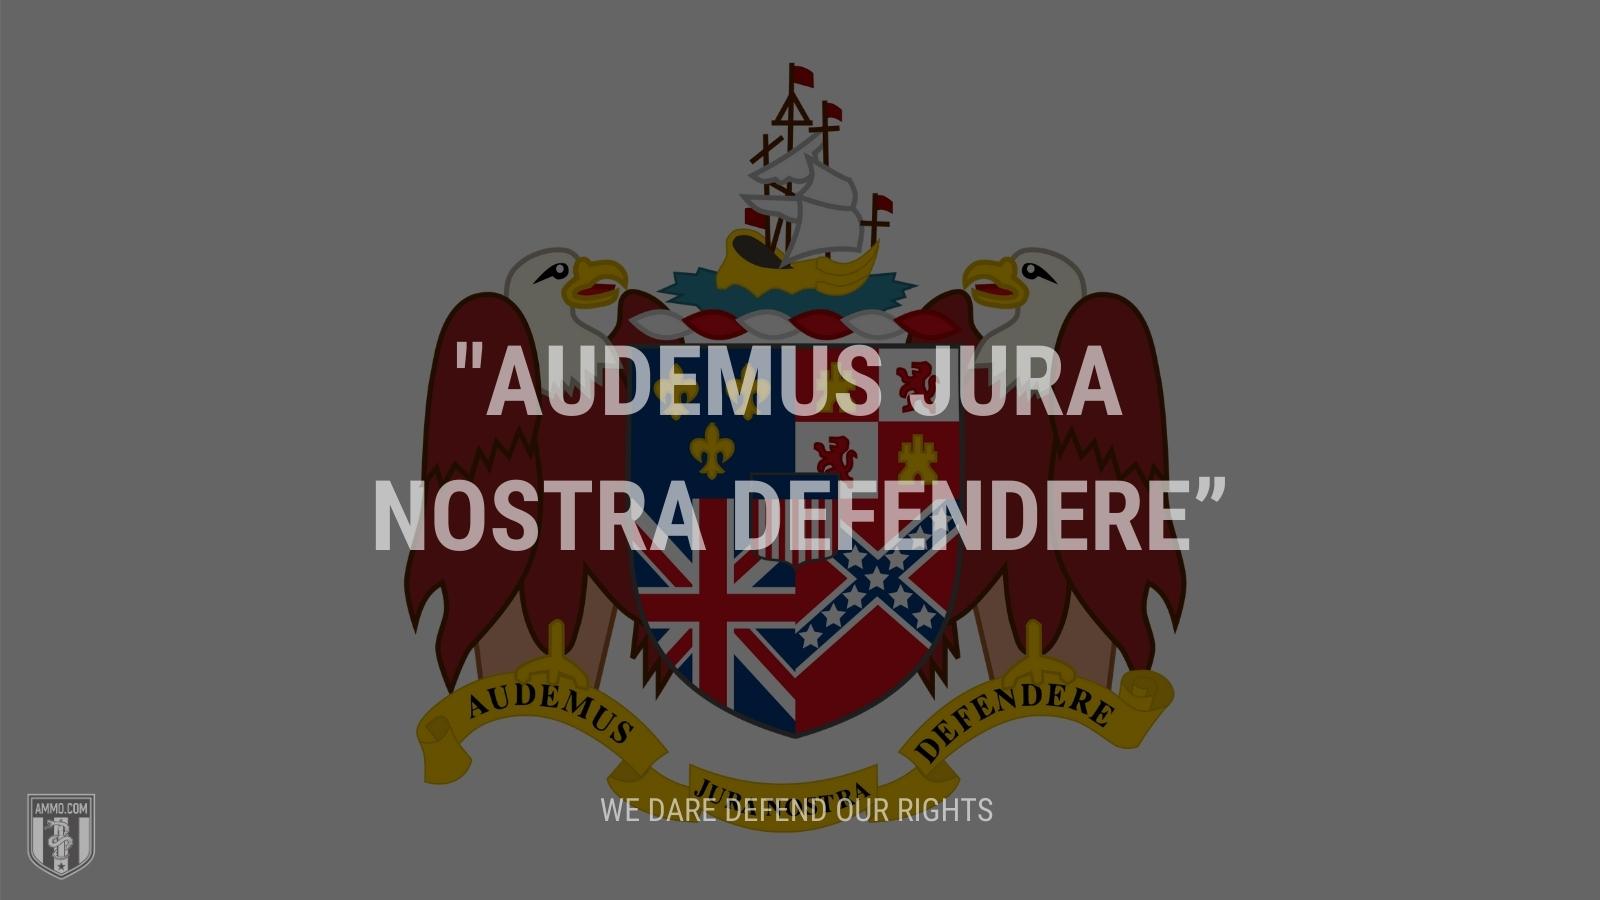 """Audemus jura nostra defendere"" - We dare defend our rights"